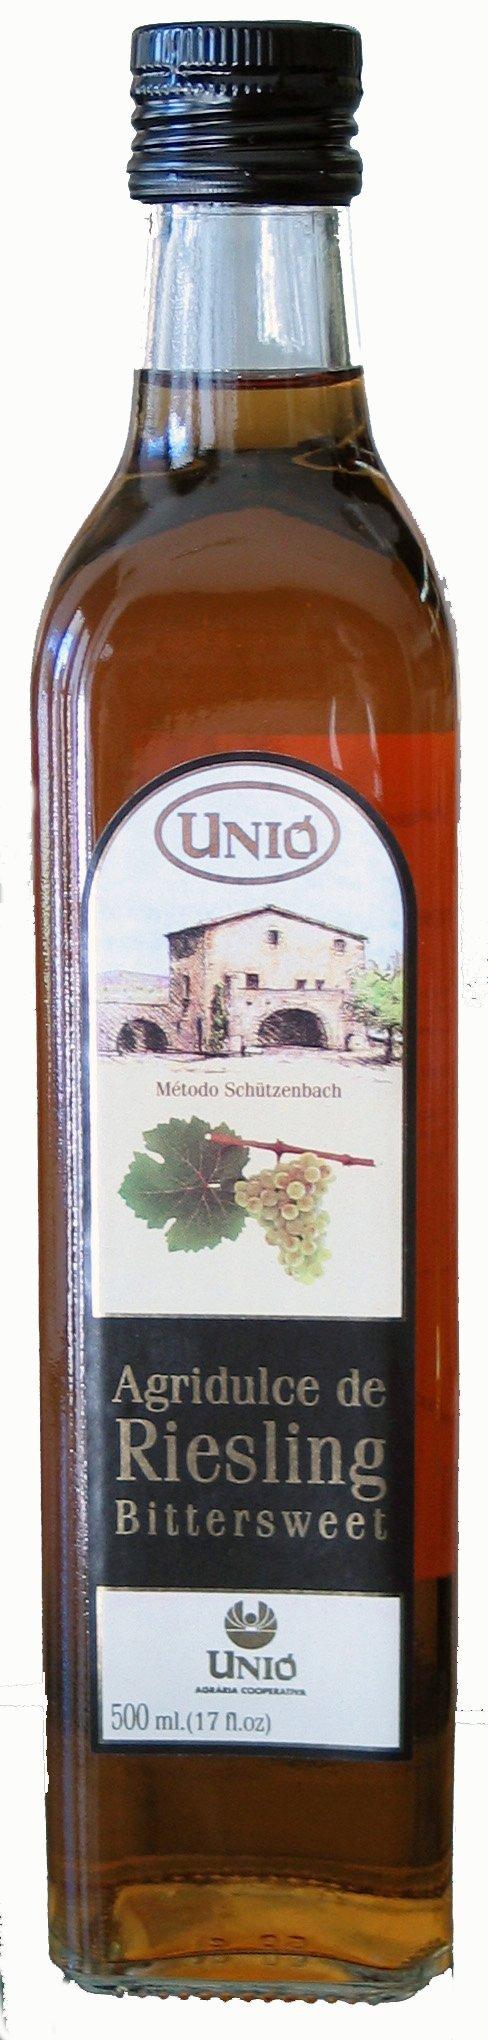 Unio Bittersweet Riesling White Wine Vinegar 500ml (17 oz) Bottle by Unio